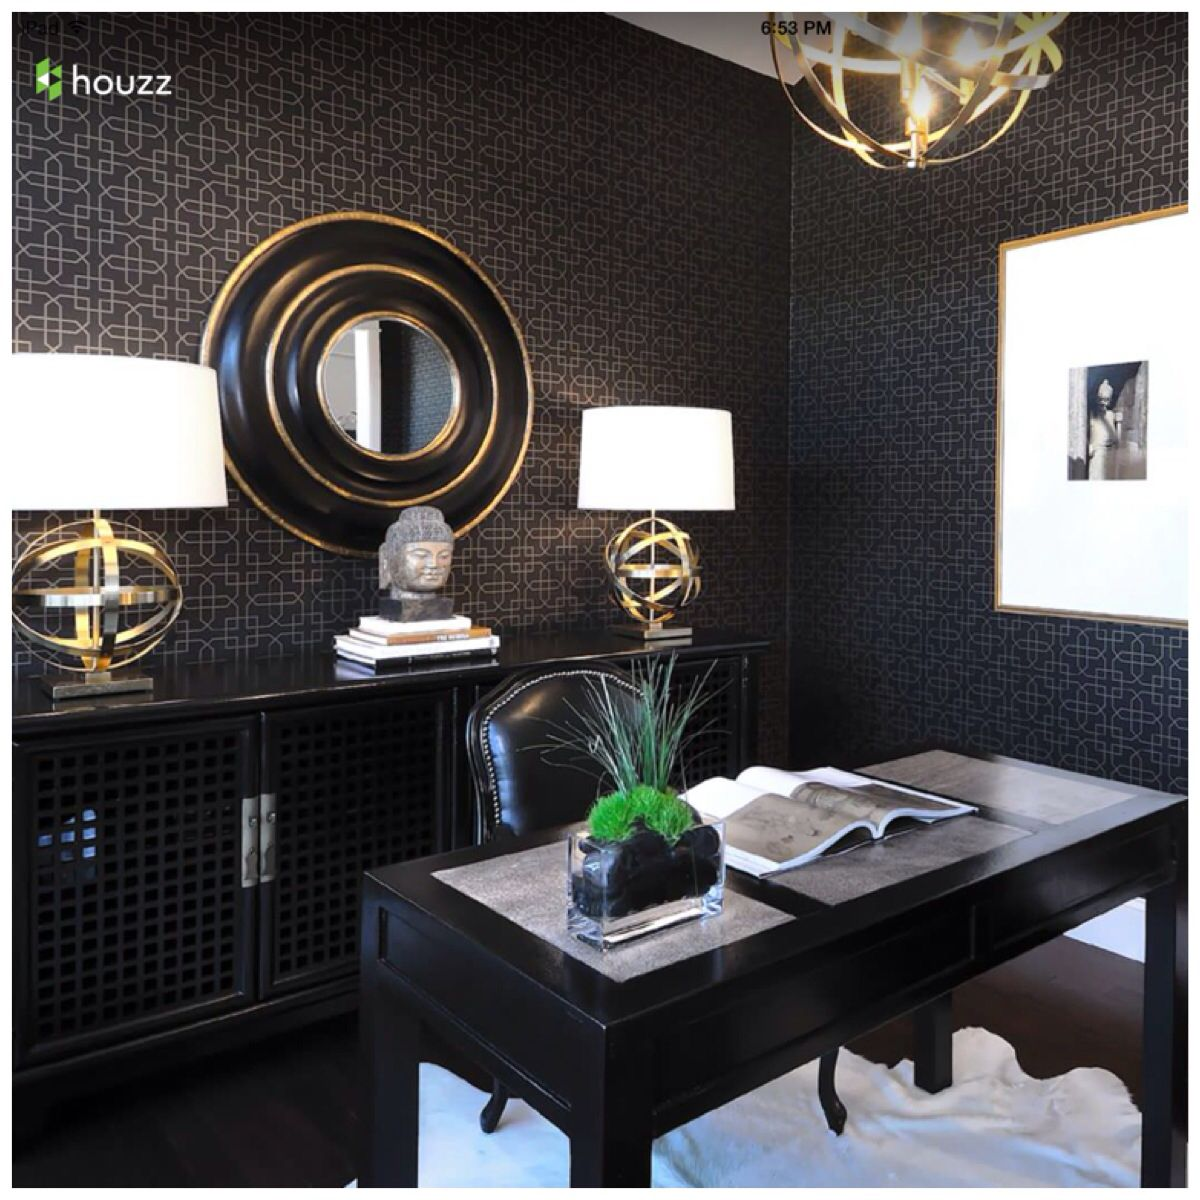 Homeoffice Den Design Ideas: Black And Ahold Glam Diva Den